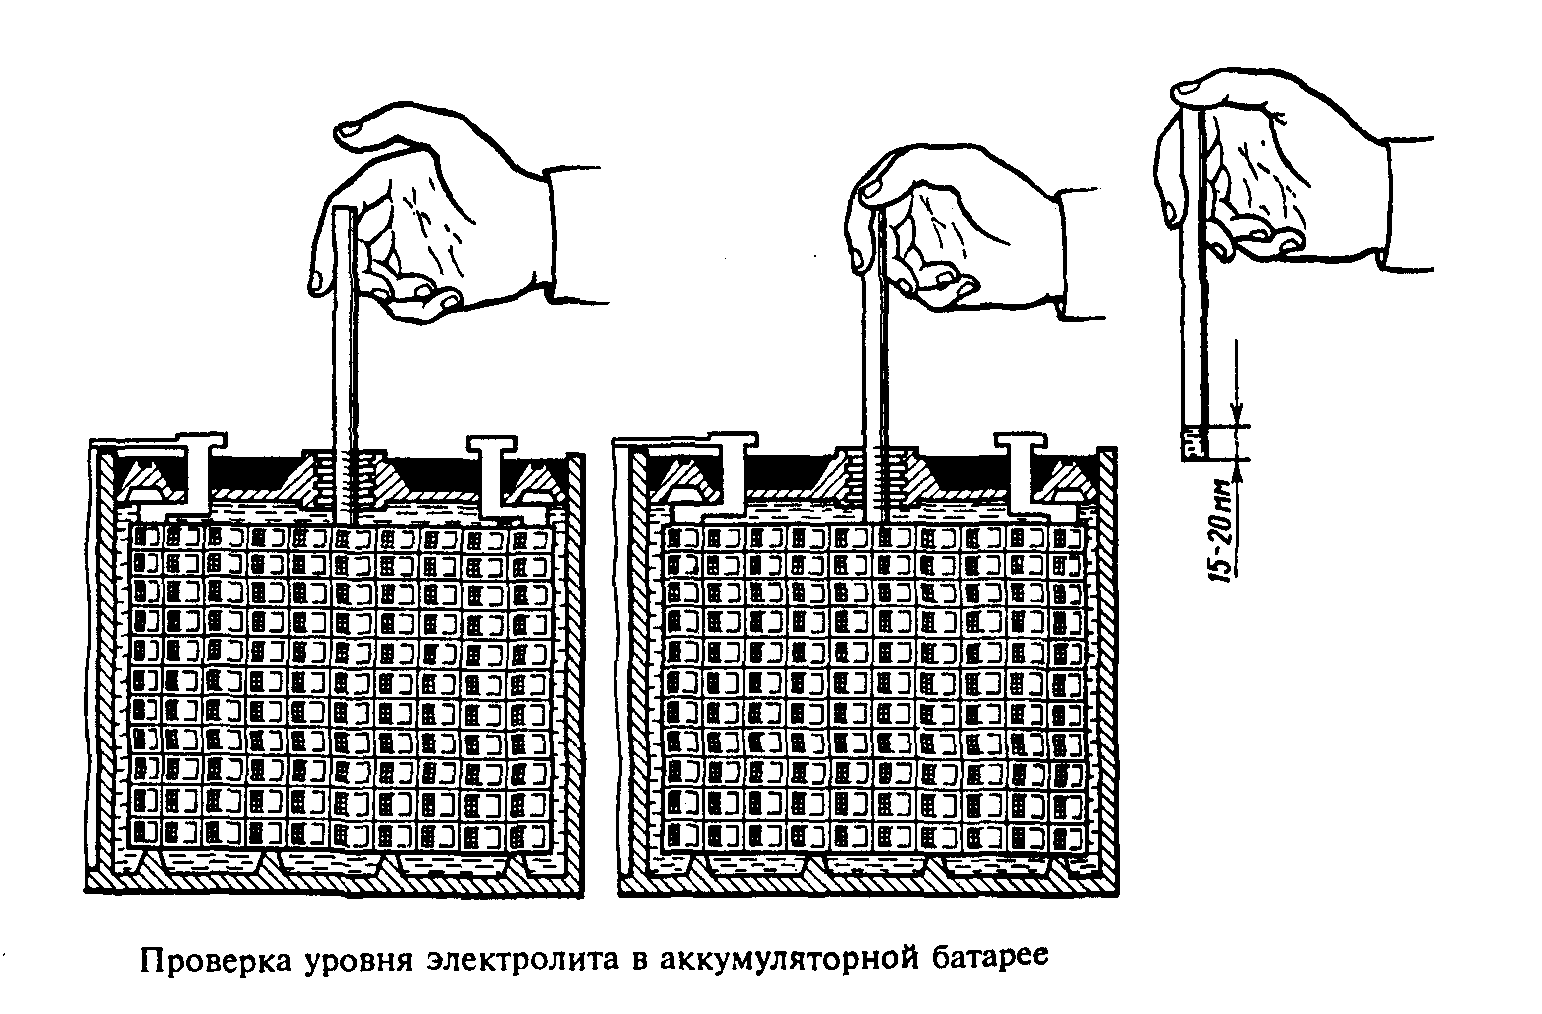 Проверка уровня электролита в аккумуляторе